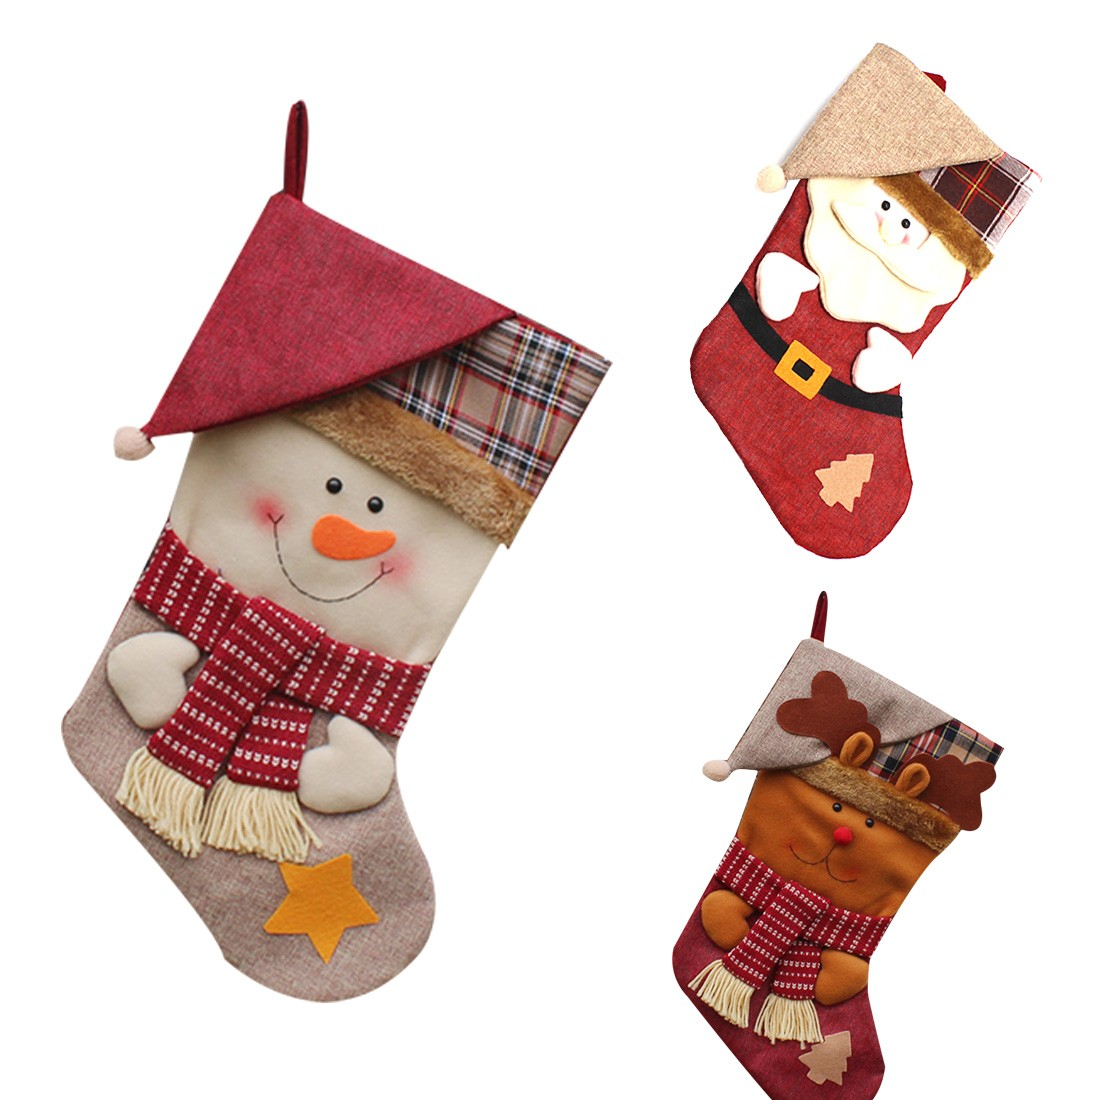 new year christmas stockings socks plaid santa claus candy. Black Bedroom Furniture Sets. Home Design Ideas